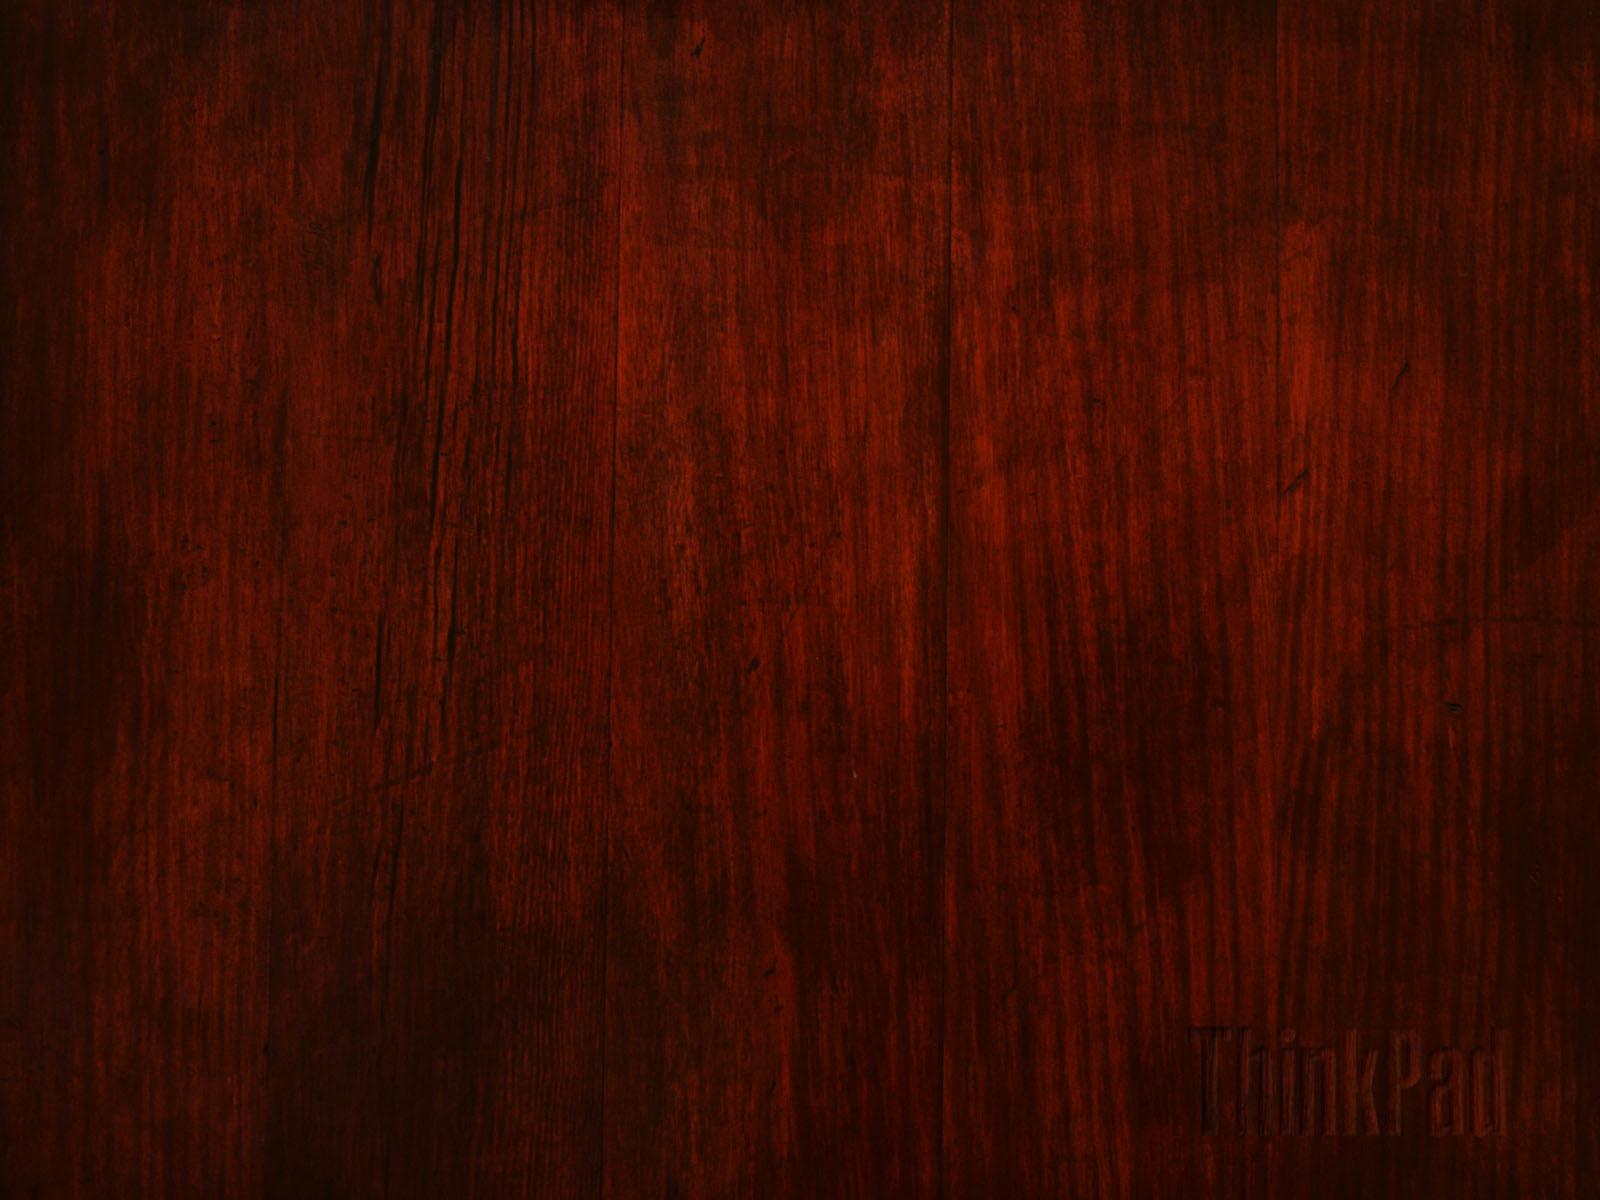 Brazilian Cherry: Dark Brazilian Cherry Wood